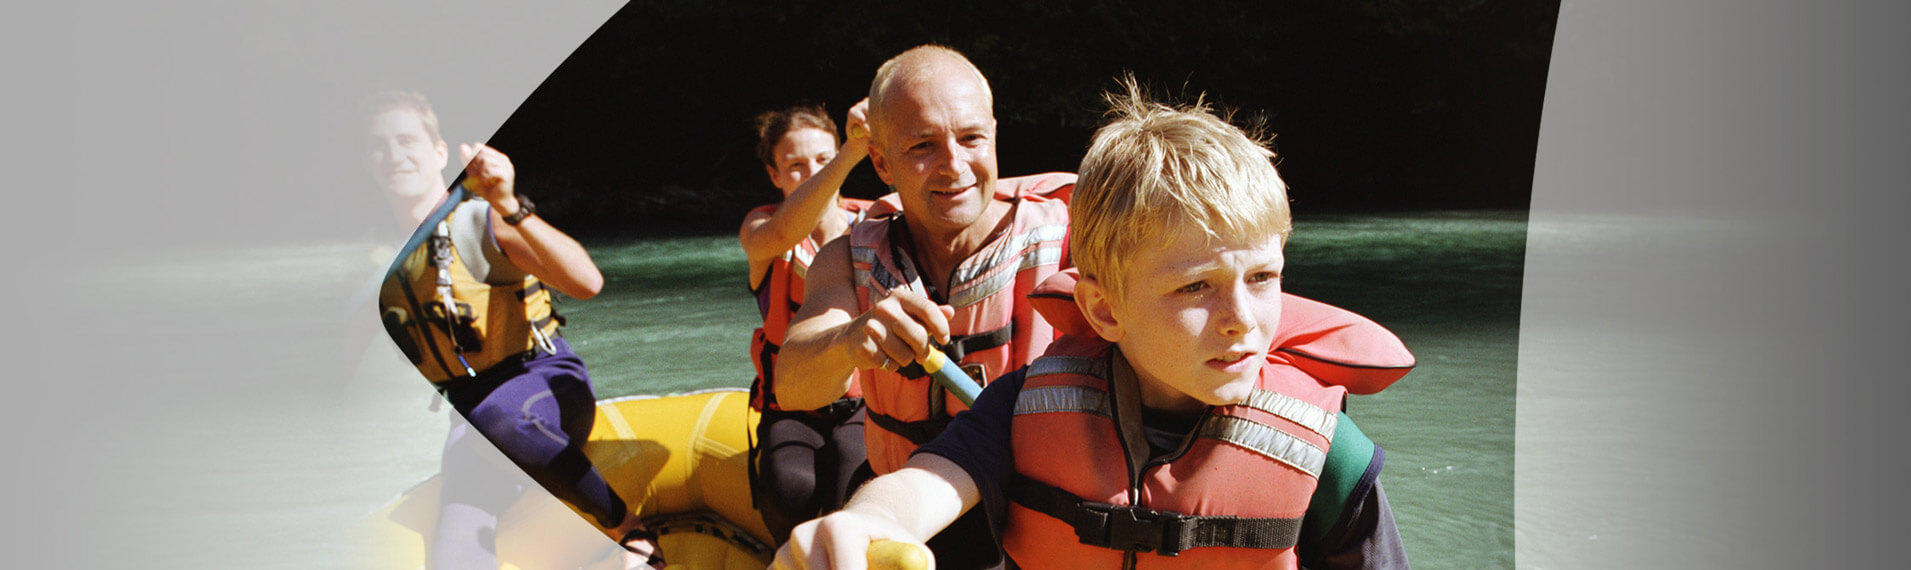 Family Paddling a Raft